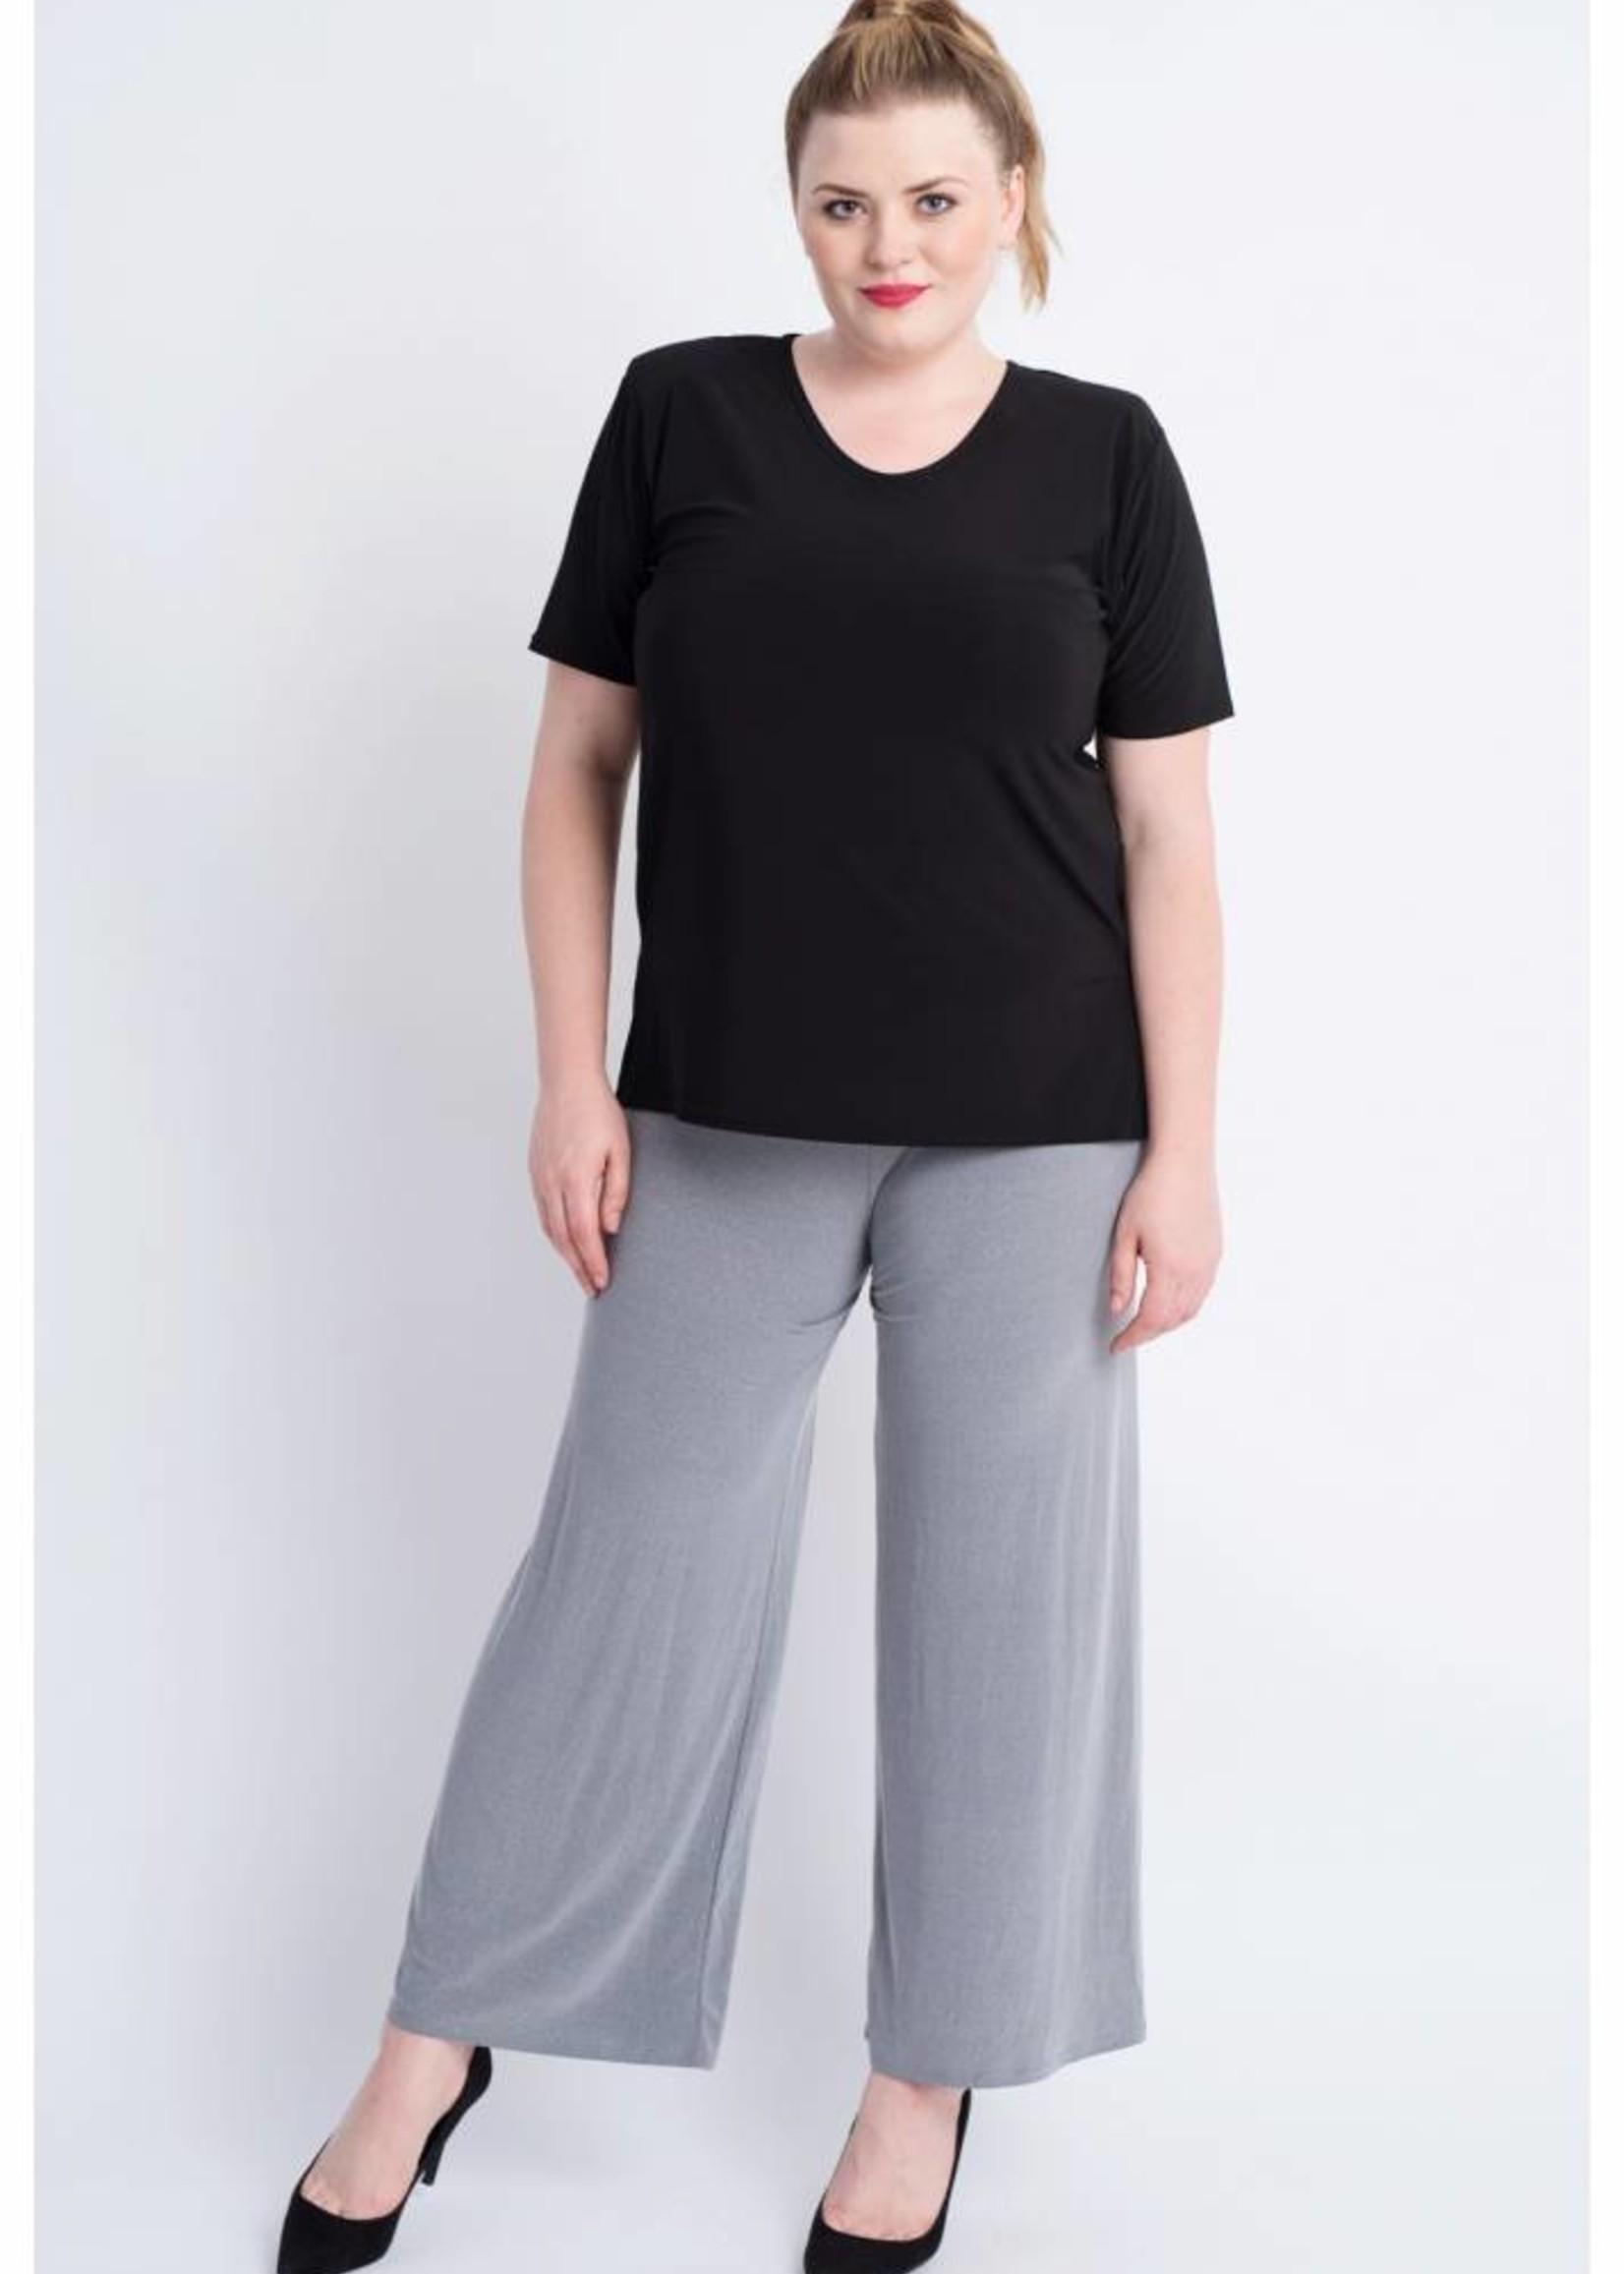 Magna Fashion Broek D03 SOLID BASIS  EXTRA LANG